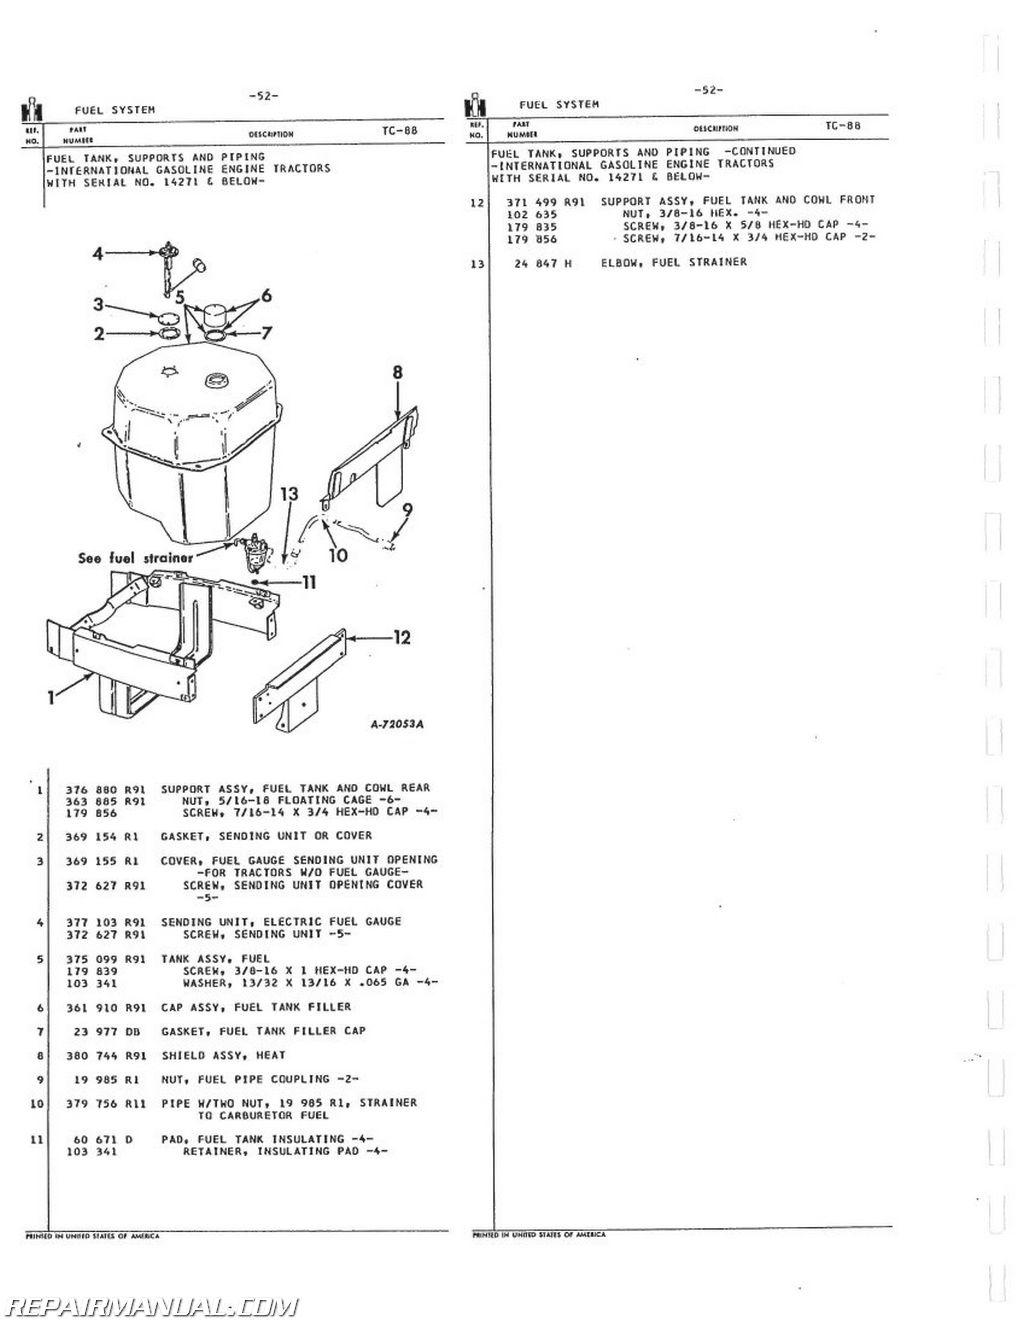 International Harvester 504 2504 Gas LP and Dsl Parts Manual